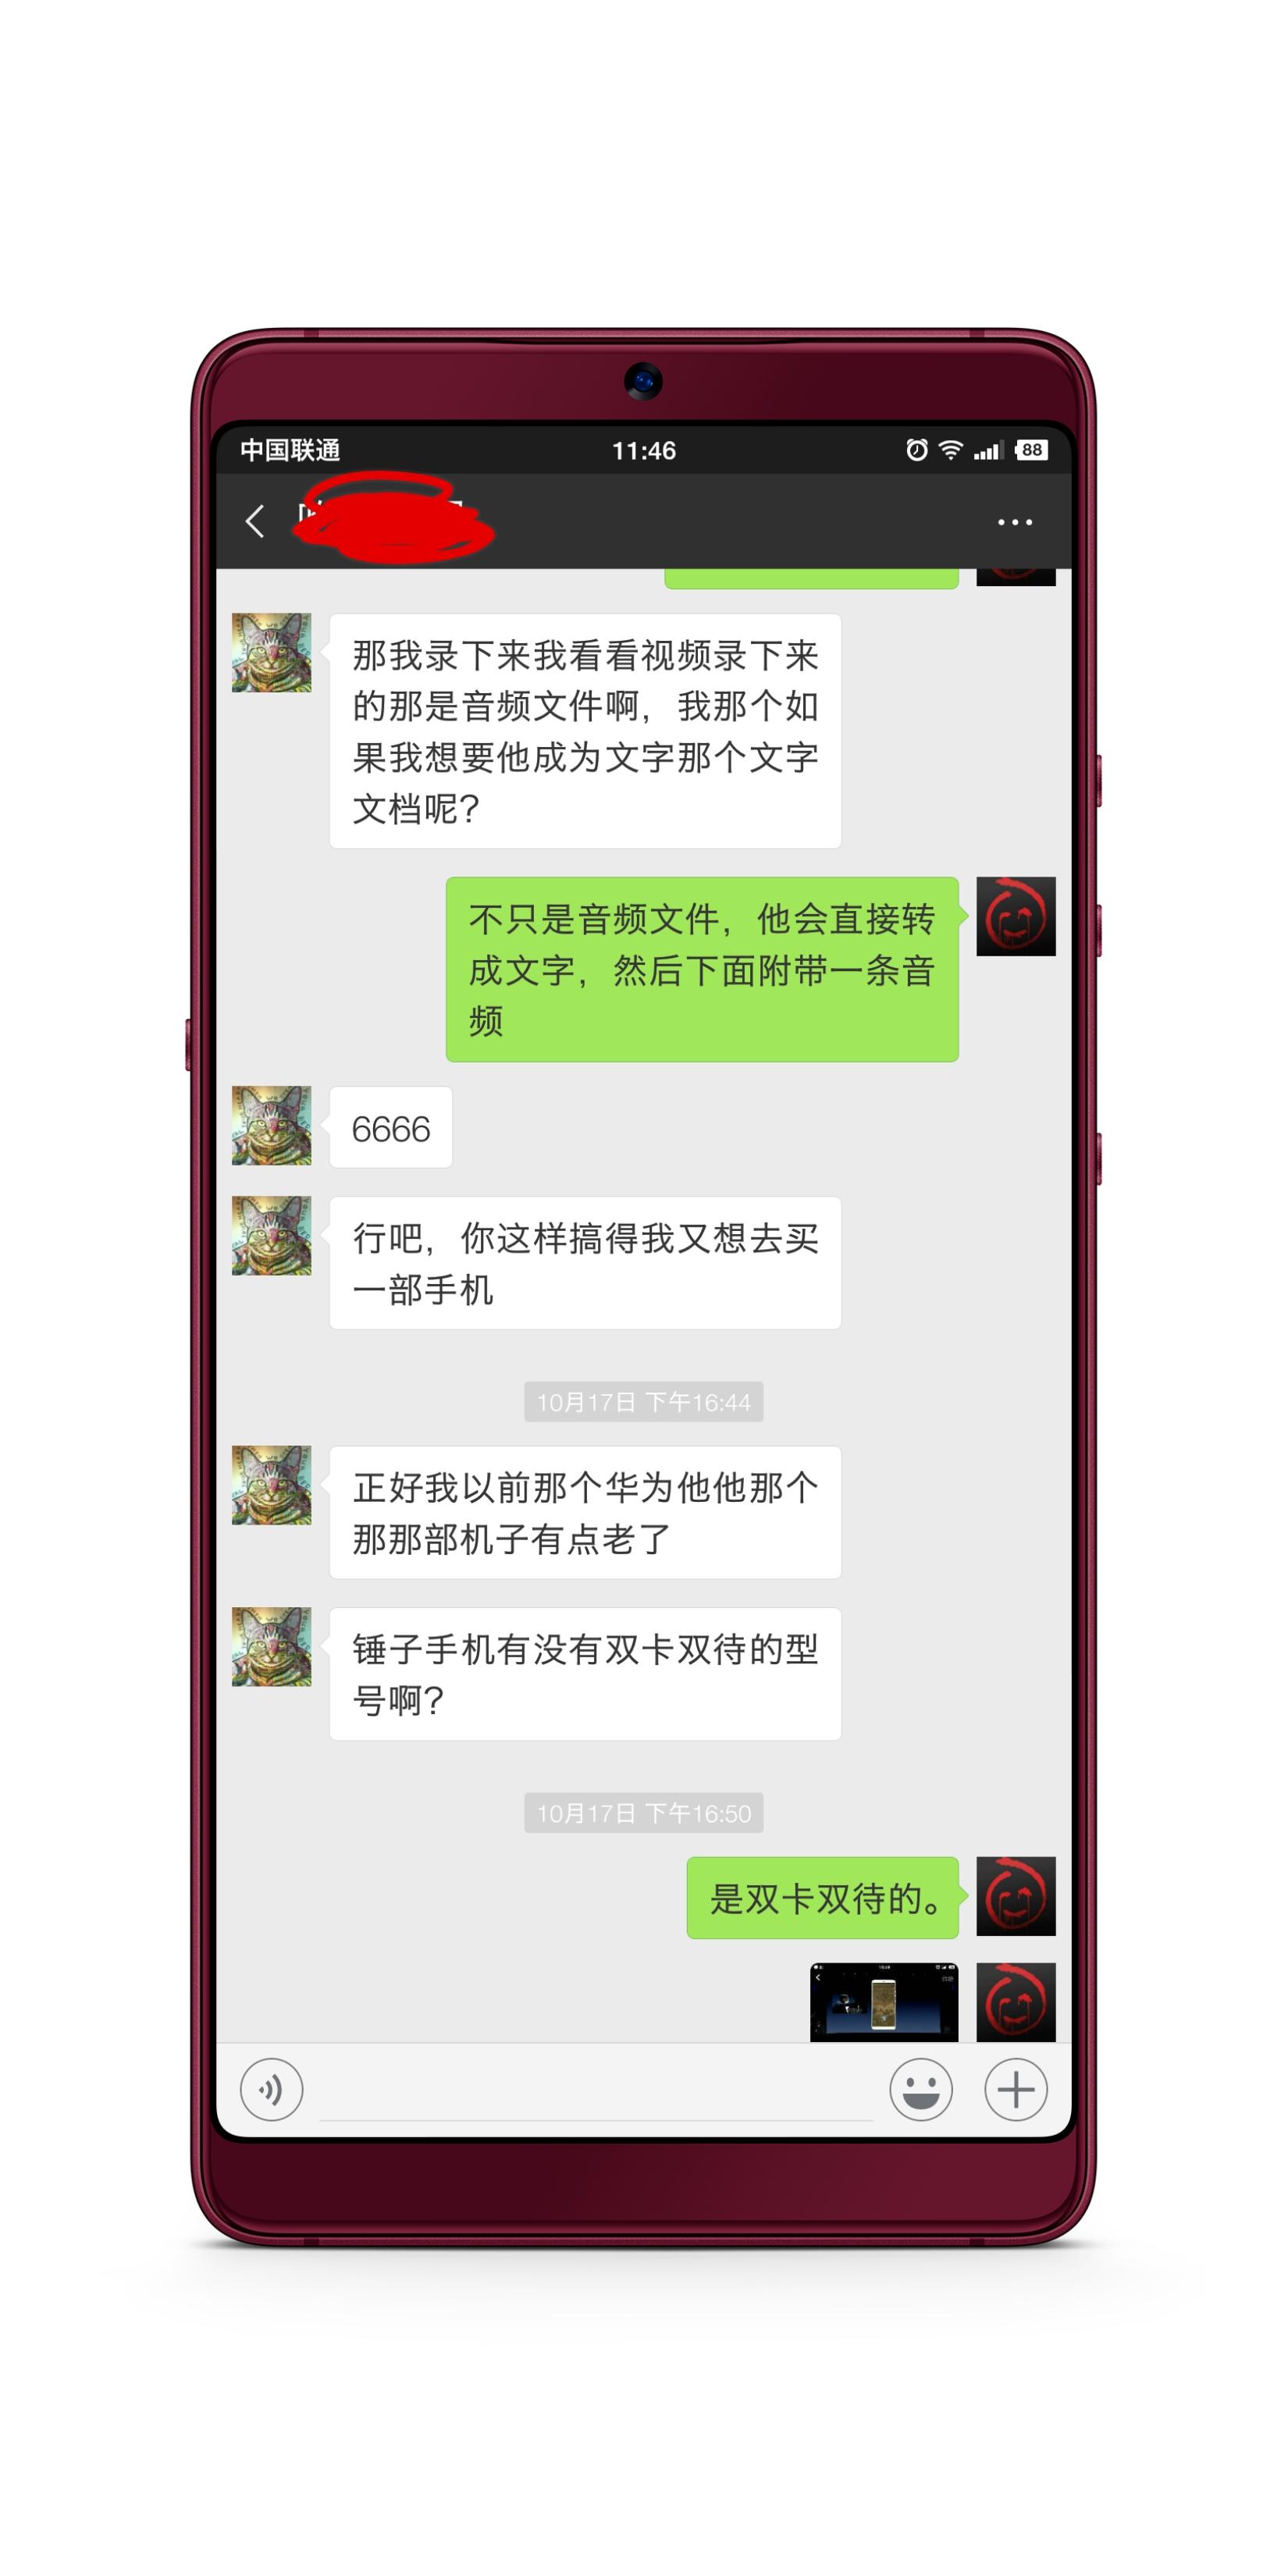 ??_Screenshot_2018-10-31-11-46-24-167_??.png